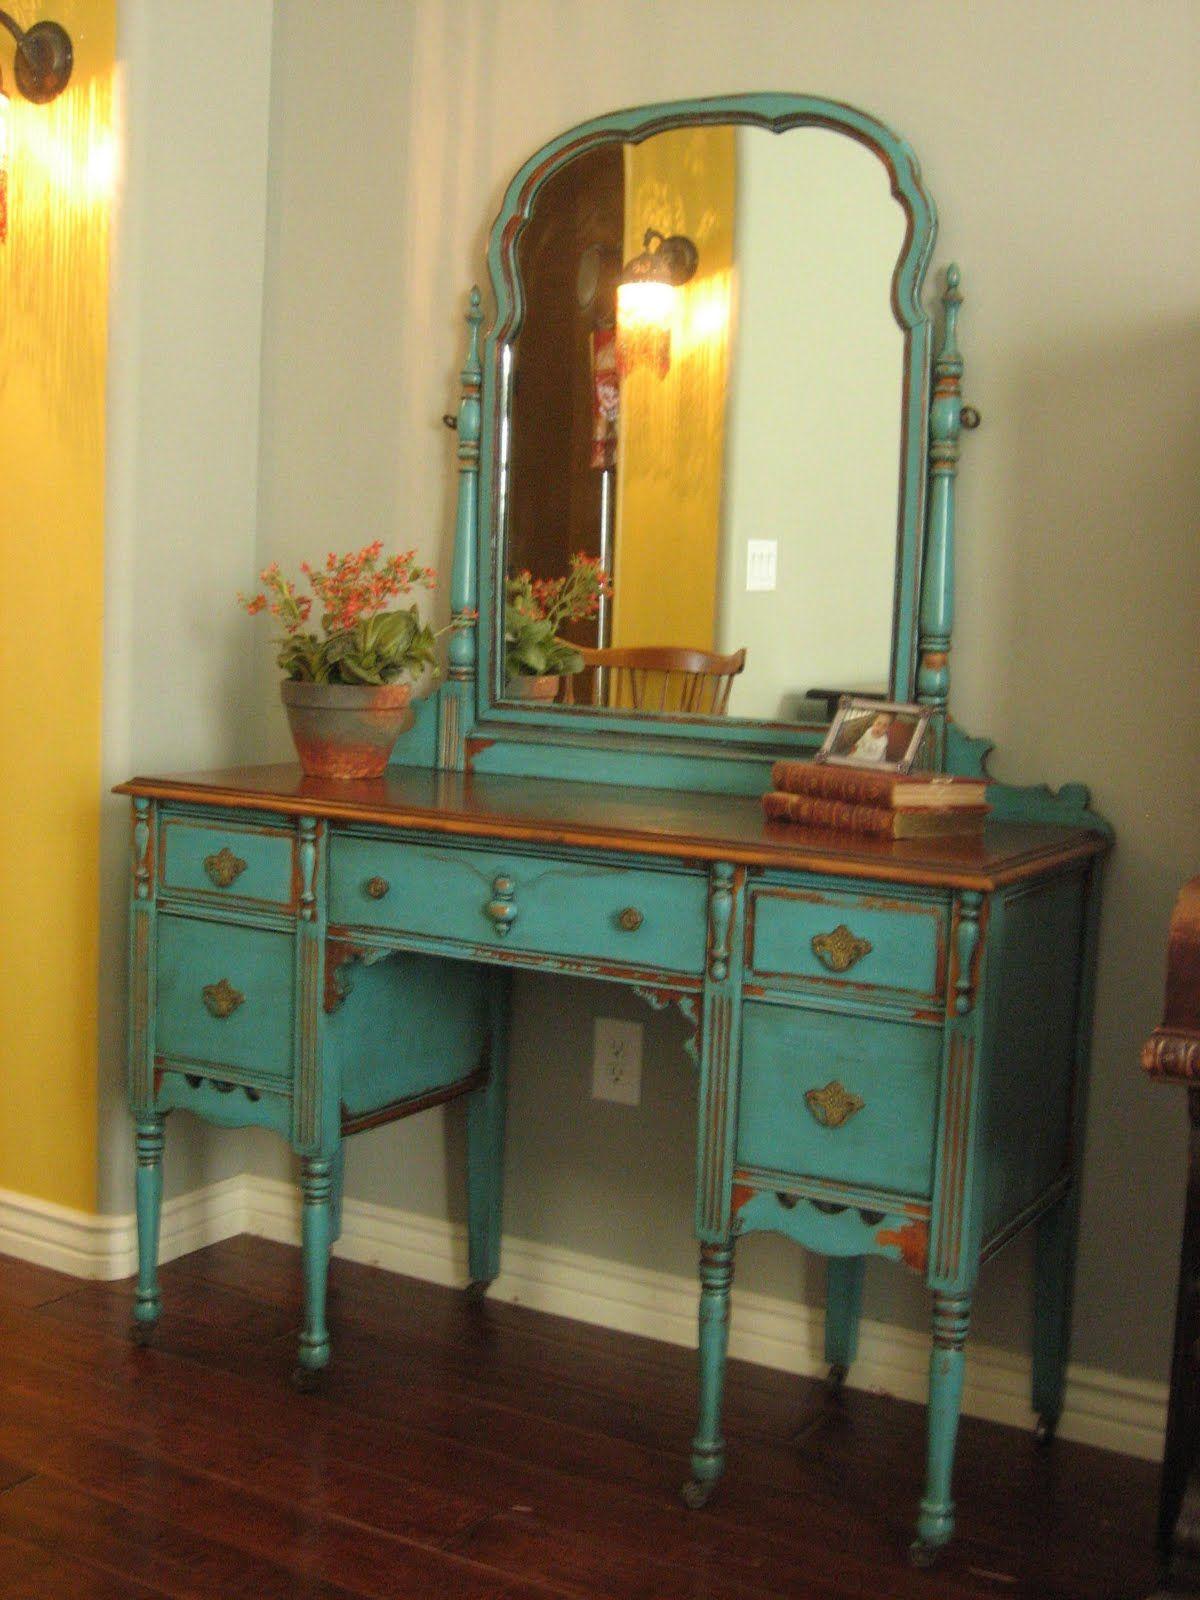 Turquoise dresser my dream home pinterest turquoise dresser